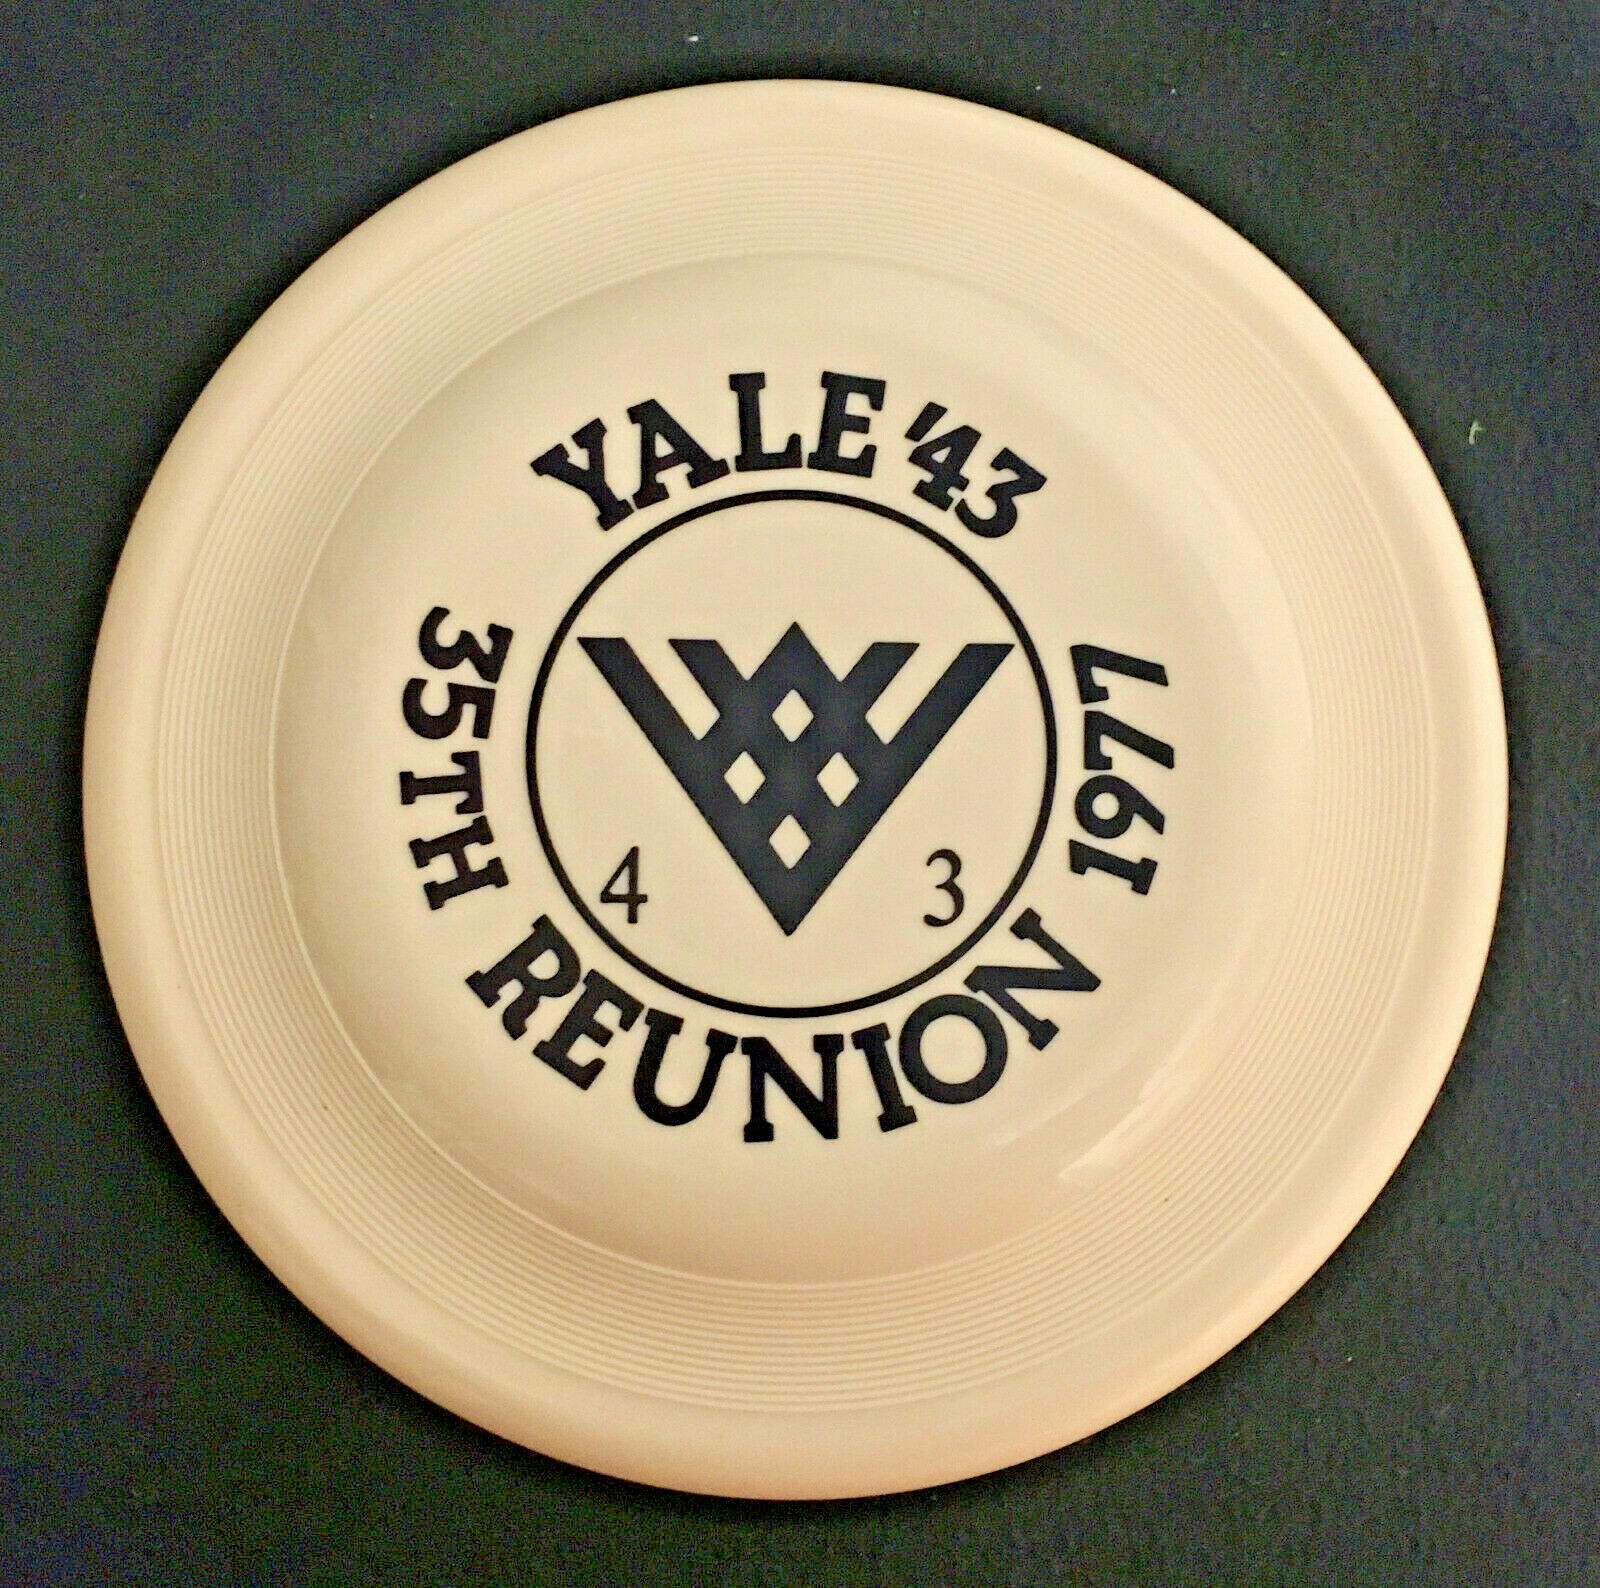 VTG 1977 Wham-o Frisbee Yale '43 35th Class Reunion   FB18.